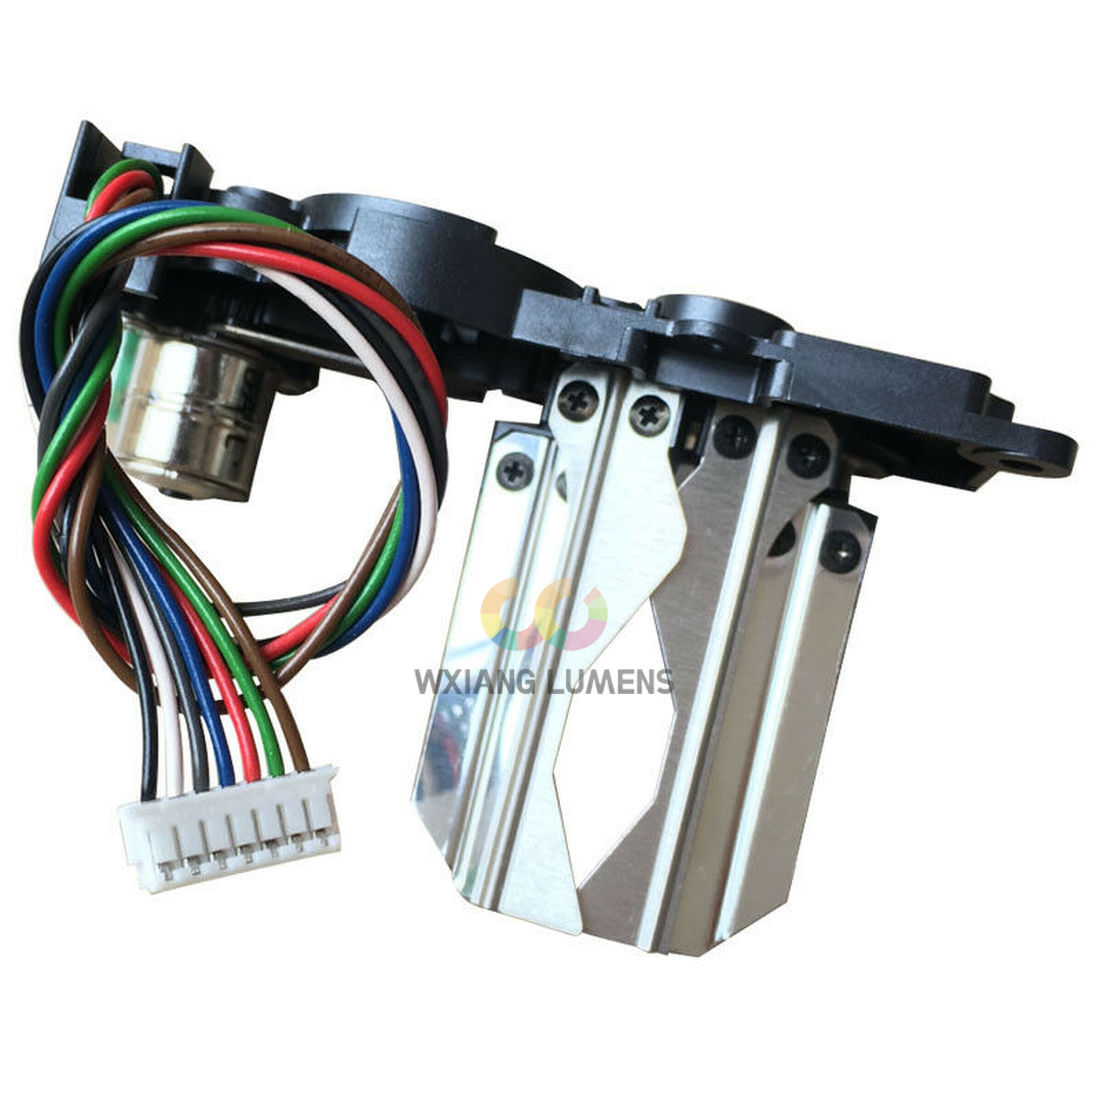 Auto IRIS Light Valve Shutter for NEC M300 M420 M350 M230X+ M260XS+ M300XS+ M320XS+ M350XS+ P420X+ Projector Repair Accessories